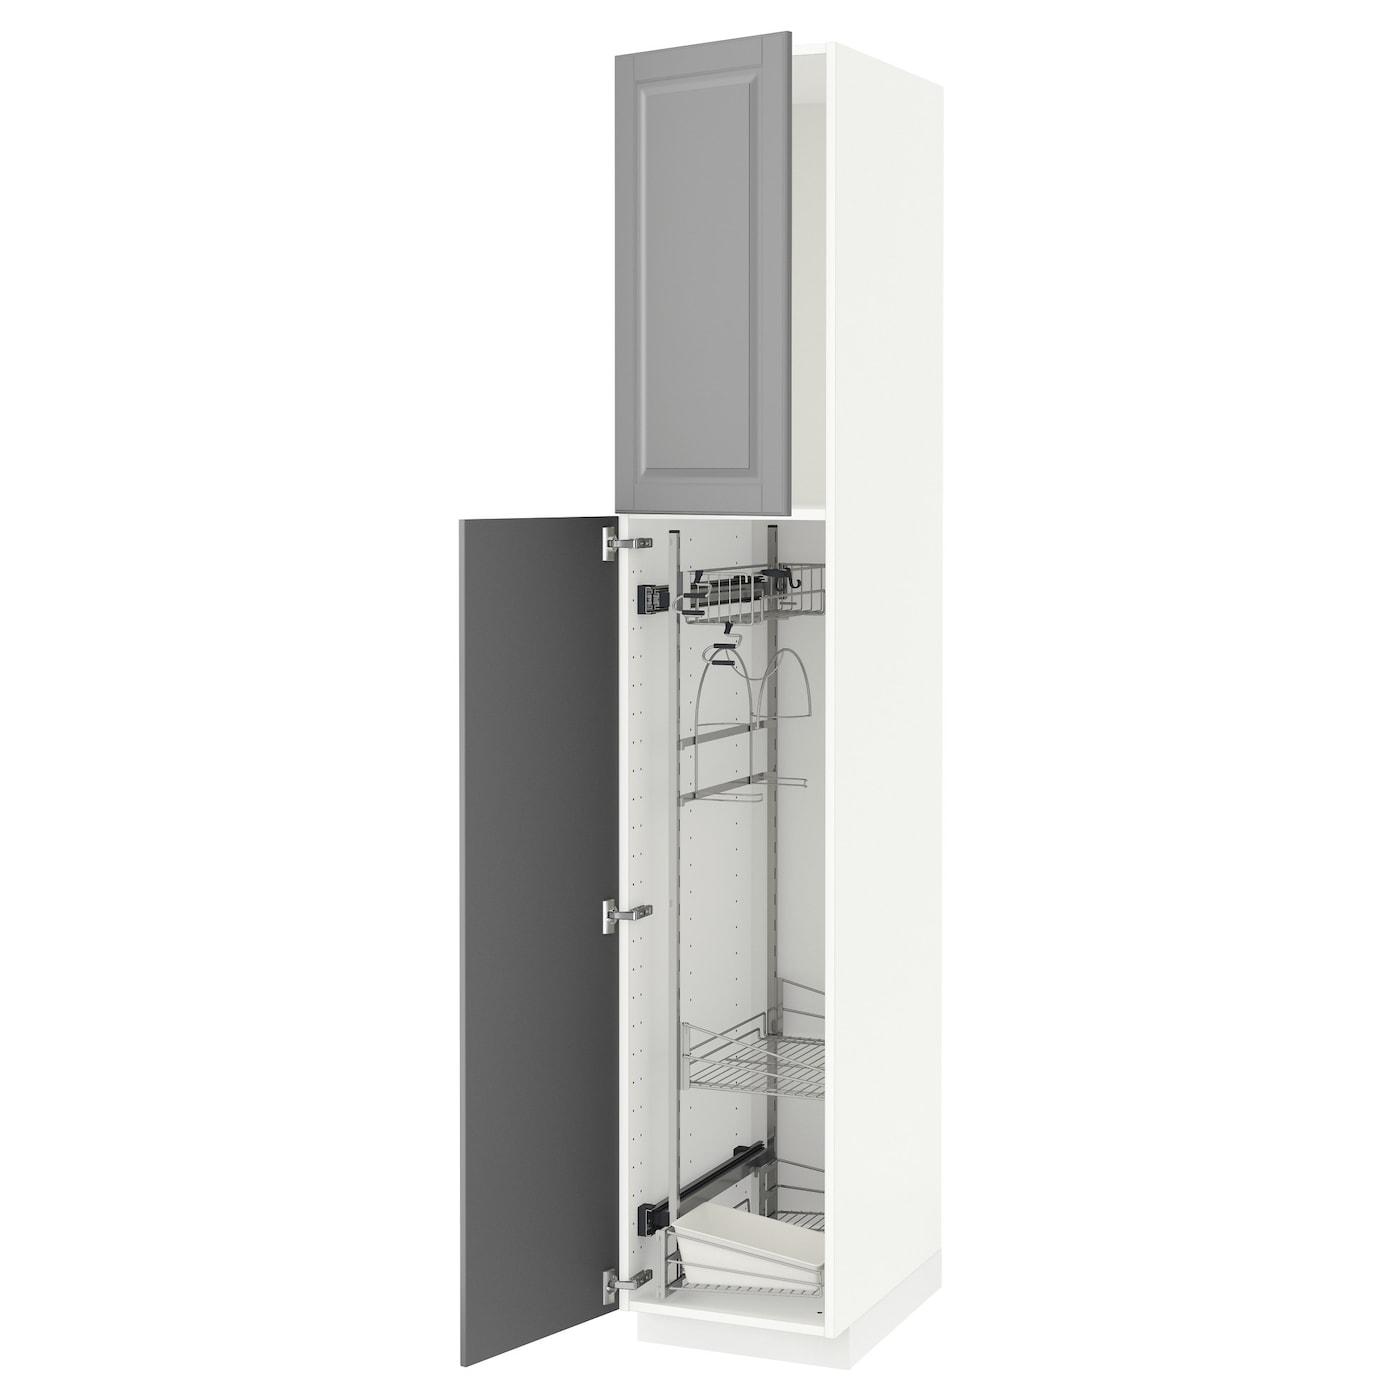 metod hoge kast inrichting schoonmkast wit bodbyn grijs 40 x 60 x 220 cm ikea. Black Bedroom Furniture Sets. Home Design Ideas